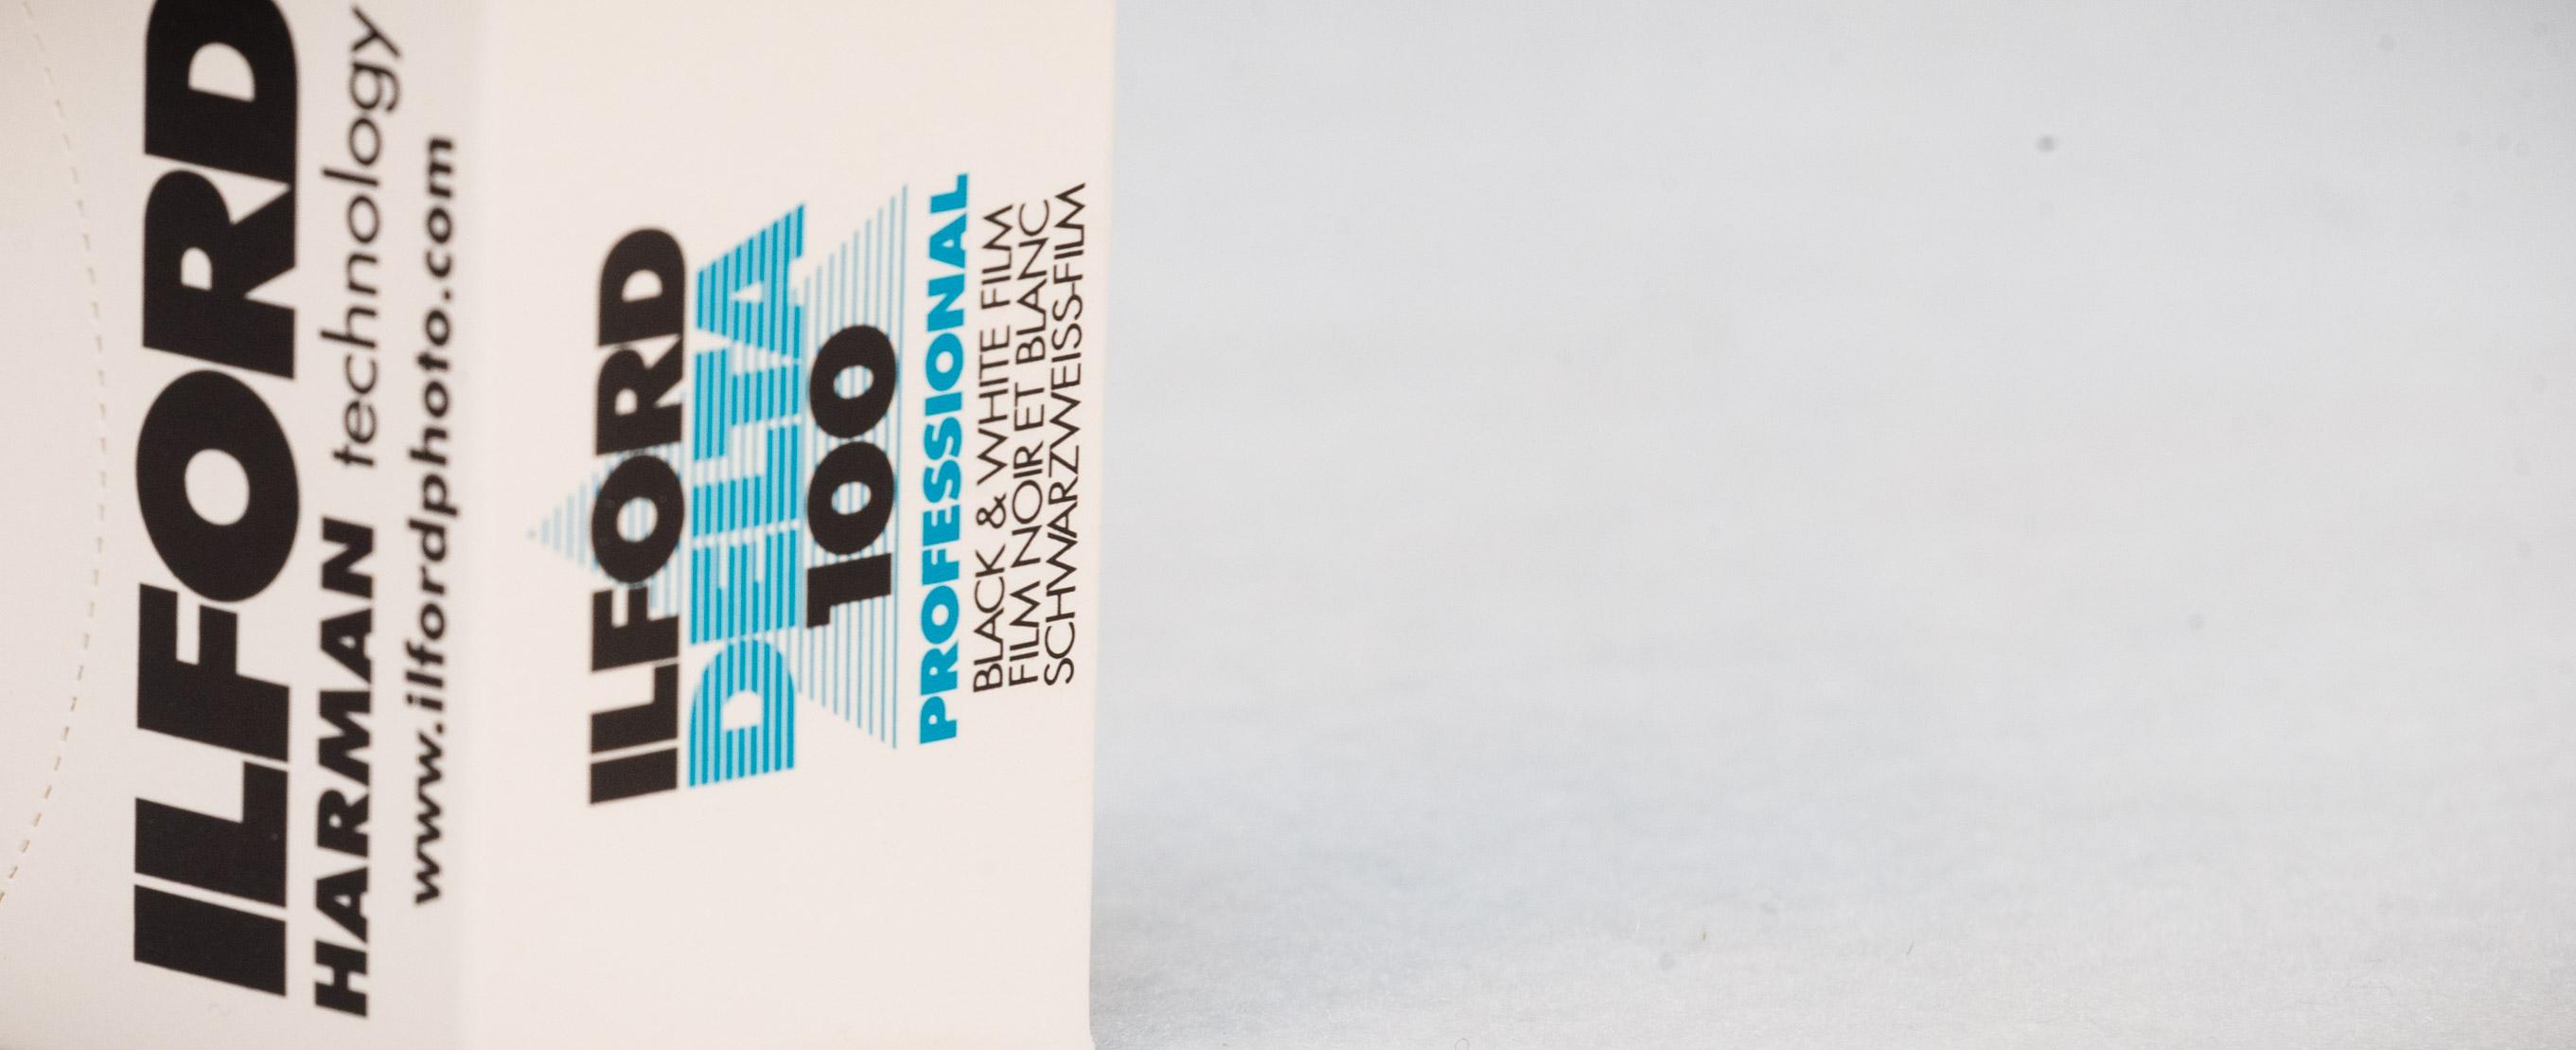 Ilford Delta Professional, Darkroom, Malta, Alan Falzon, Film, Analog, 35mm Film, ASA 3200